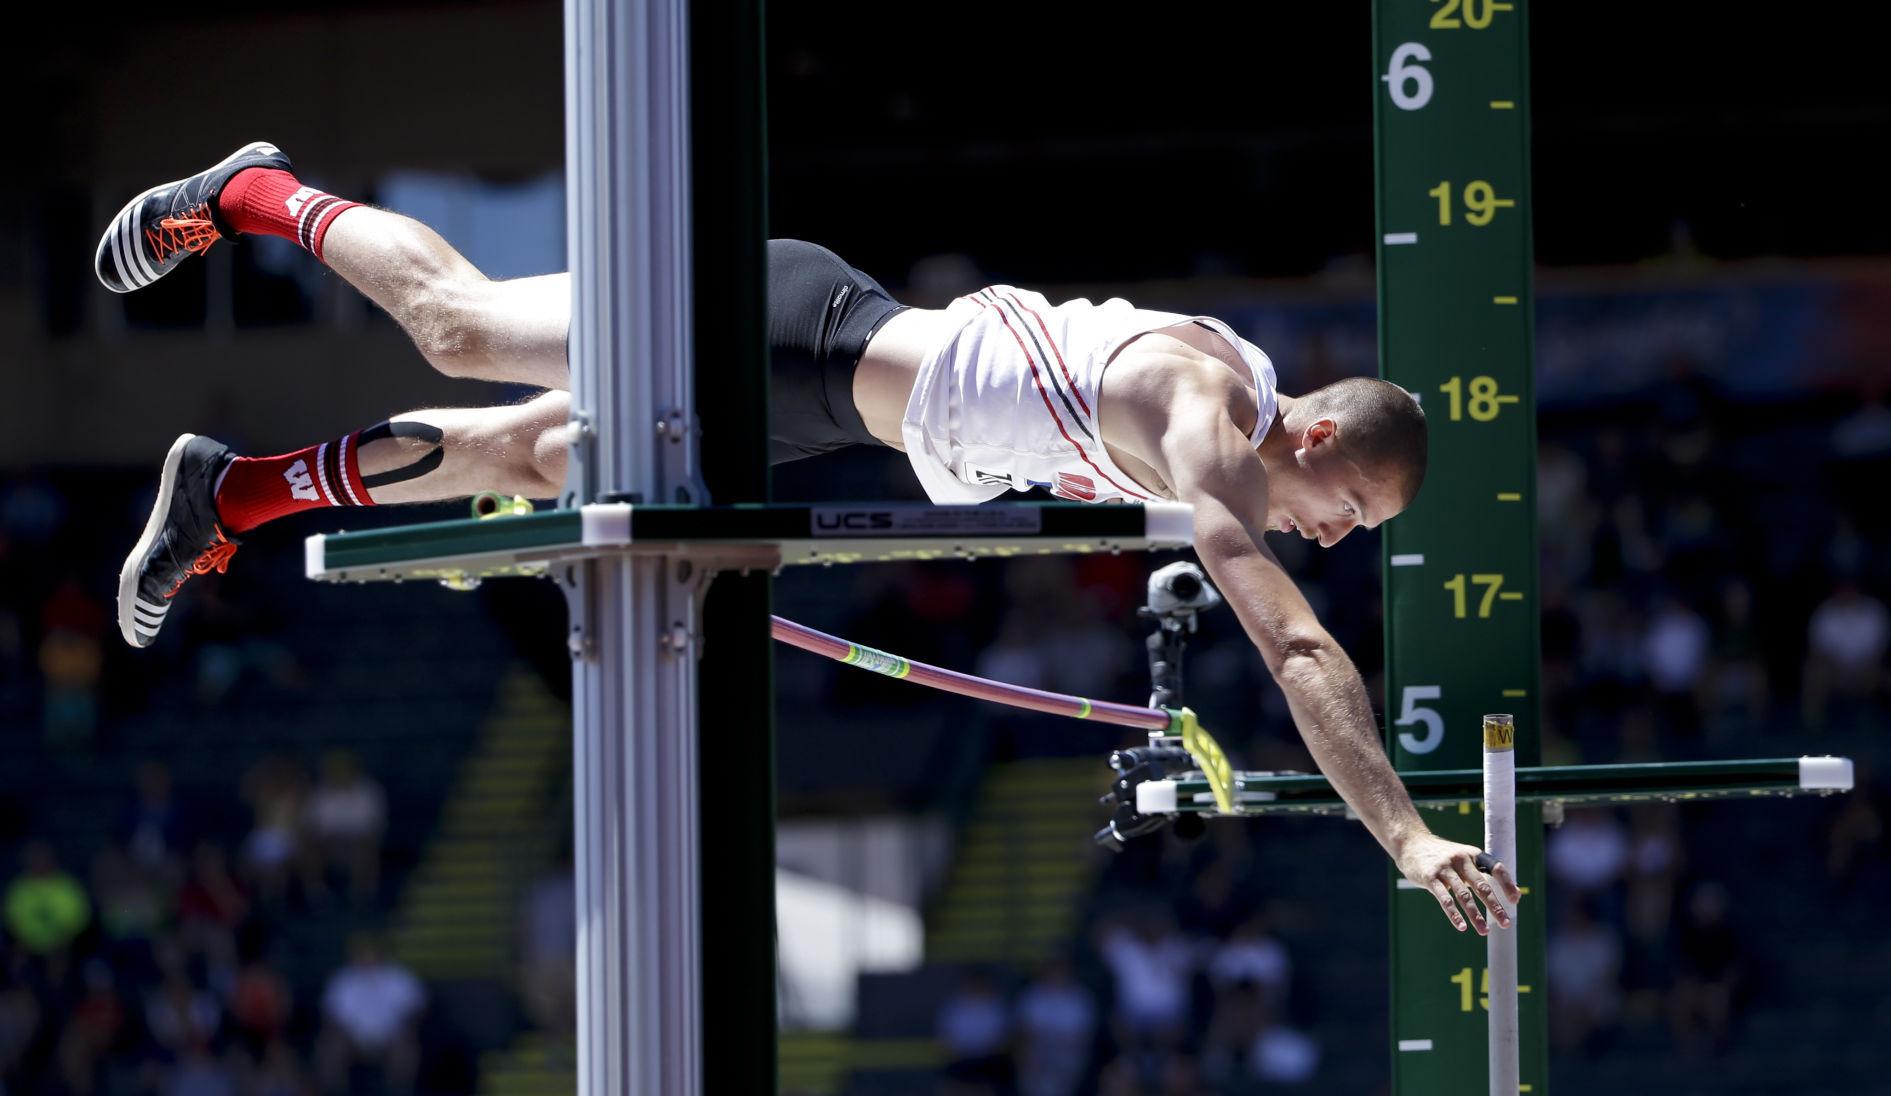 Zach Ziemek decathlon